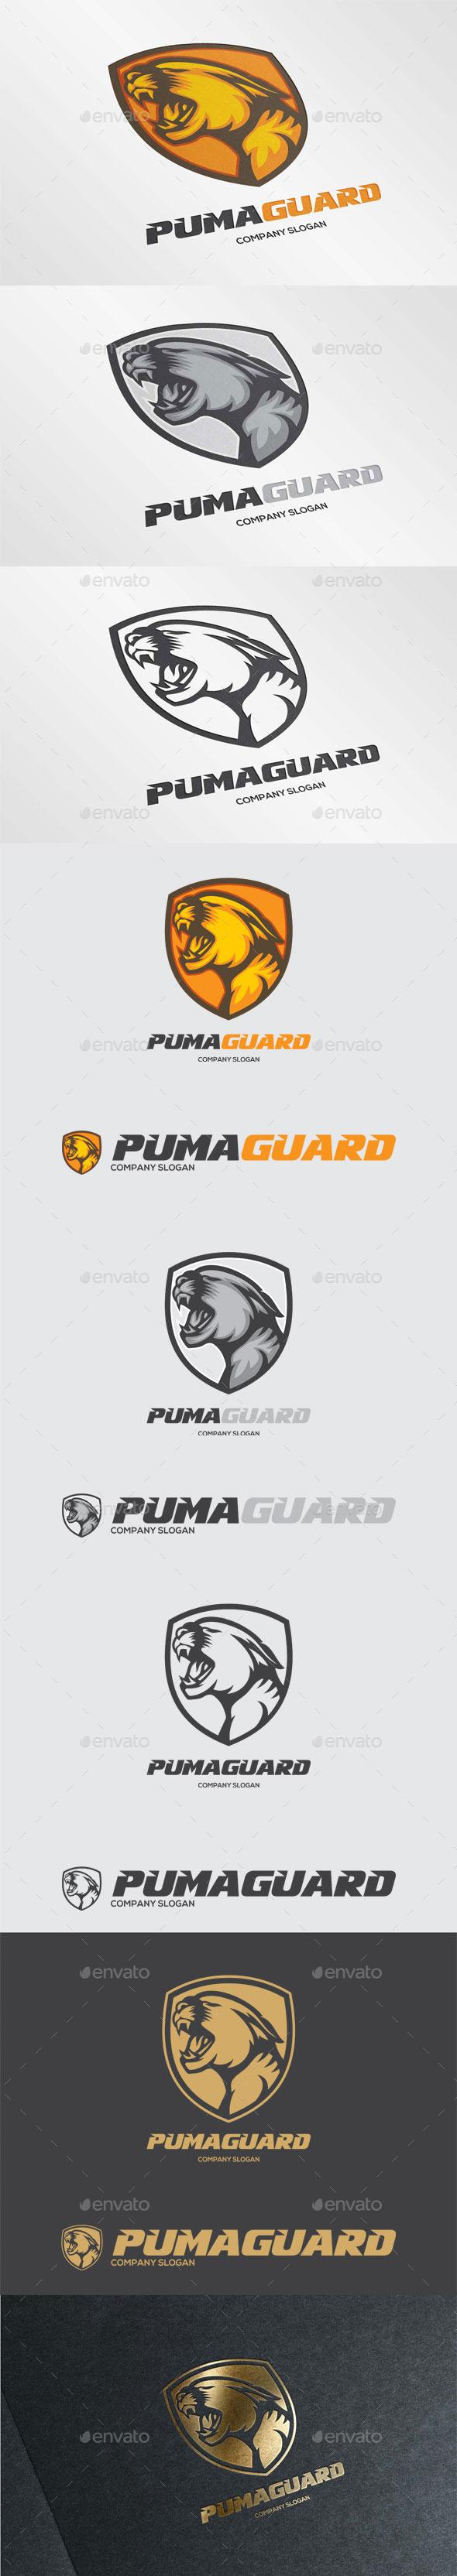 Puma Guard Logo Template - Animals Logo Templates